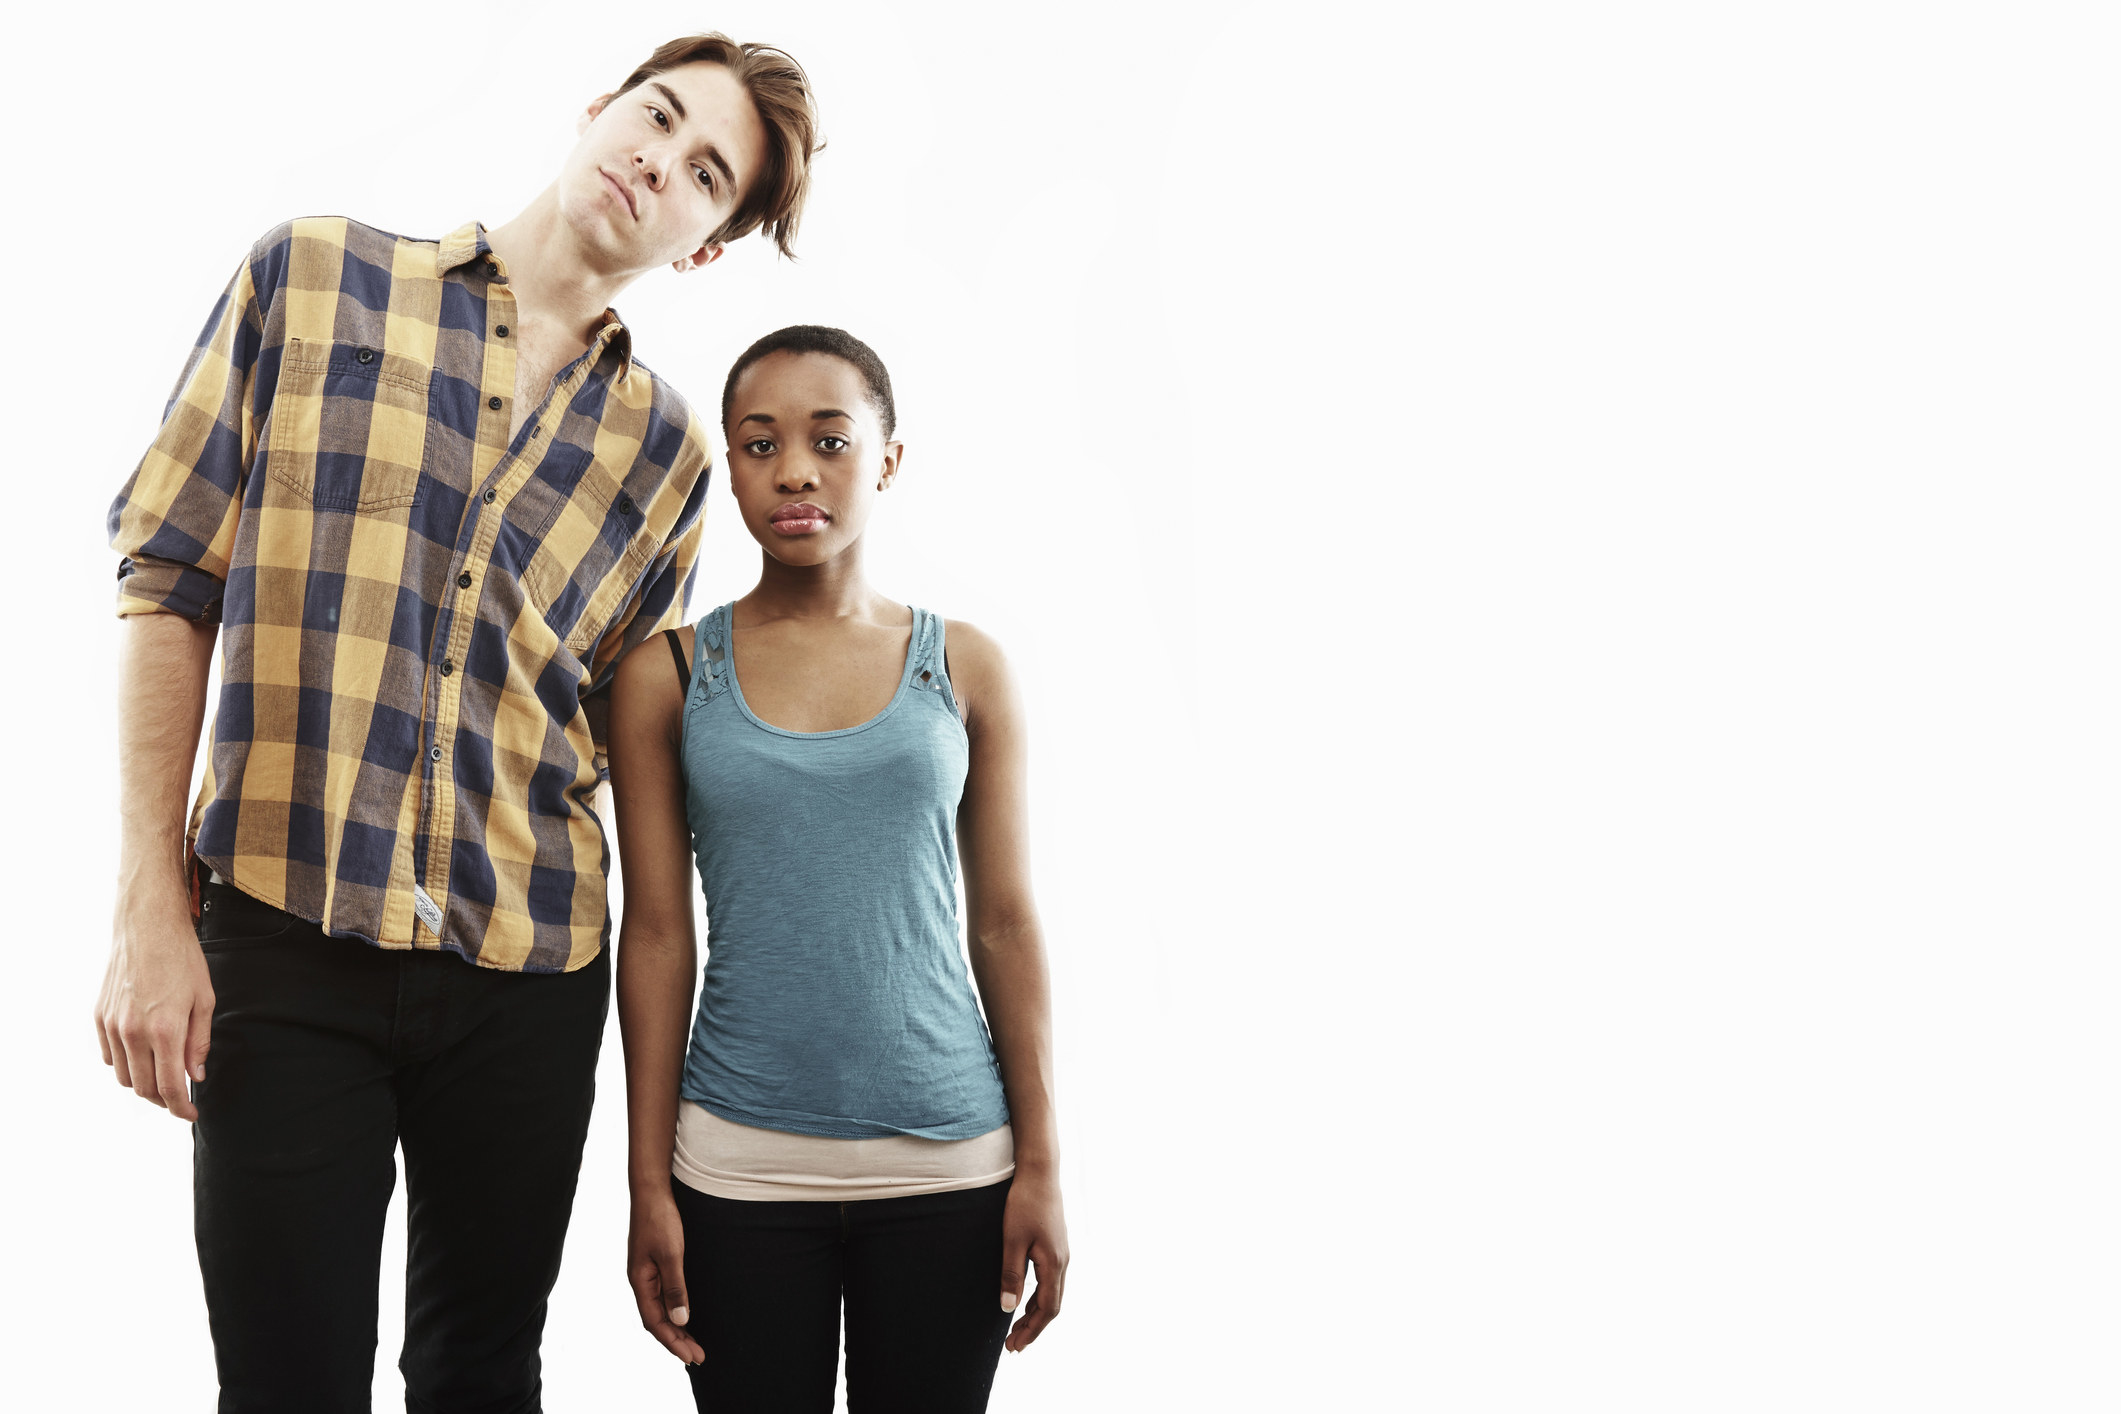 A man very tall man standing next to a much shorter woman